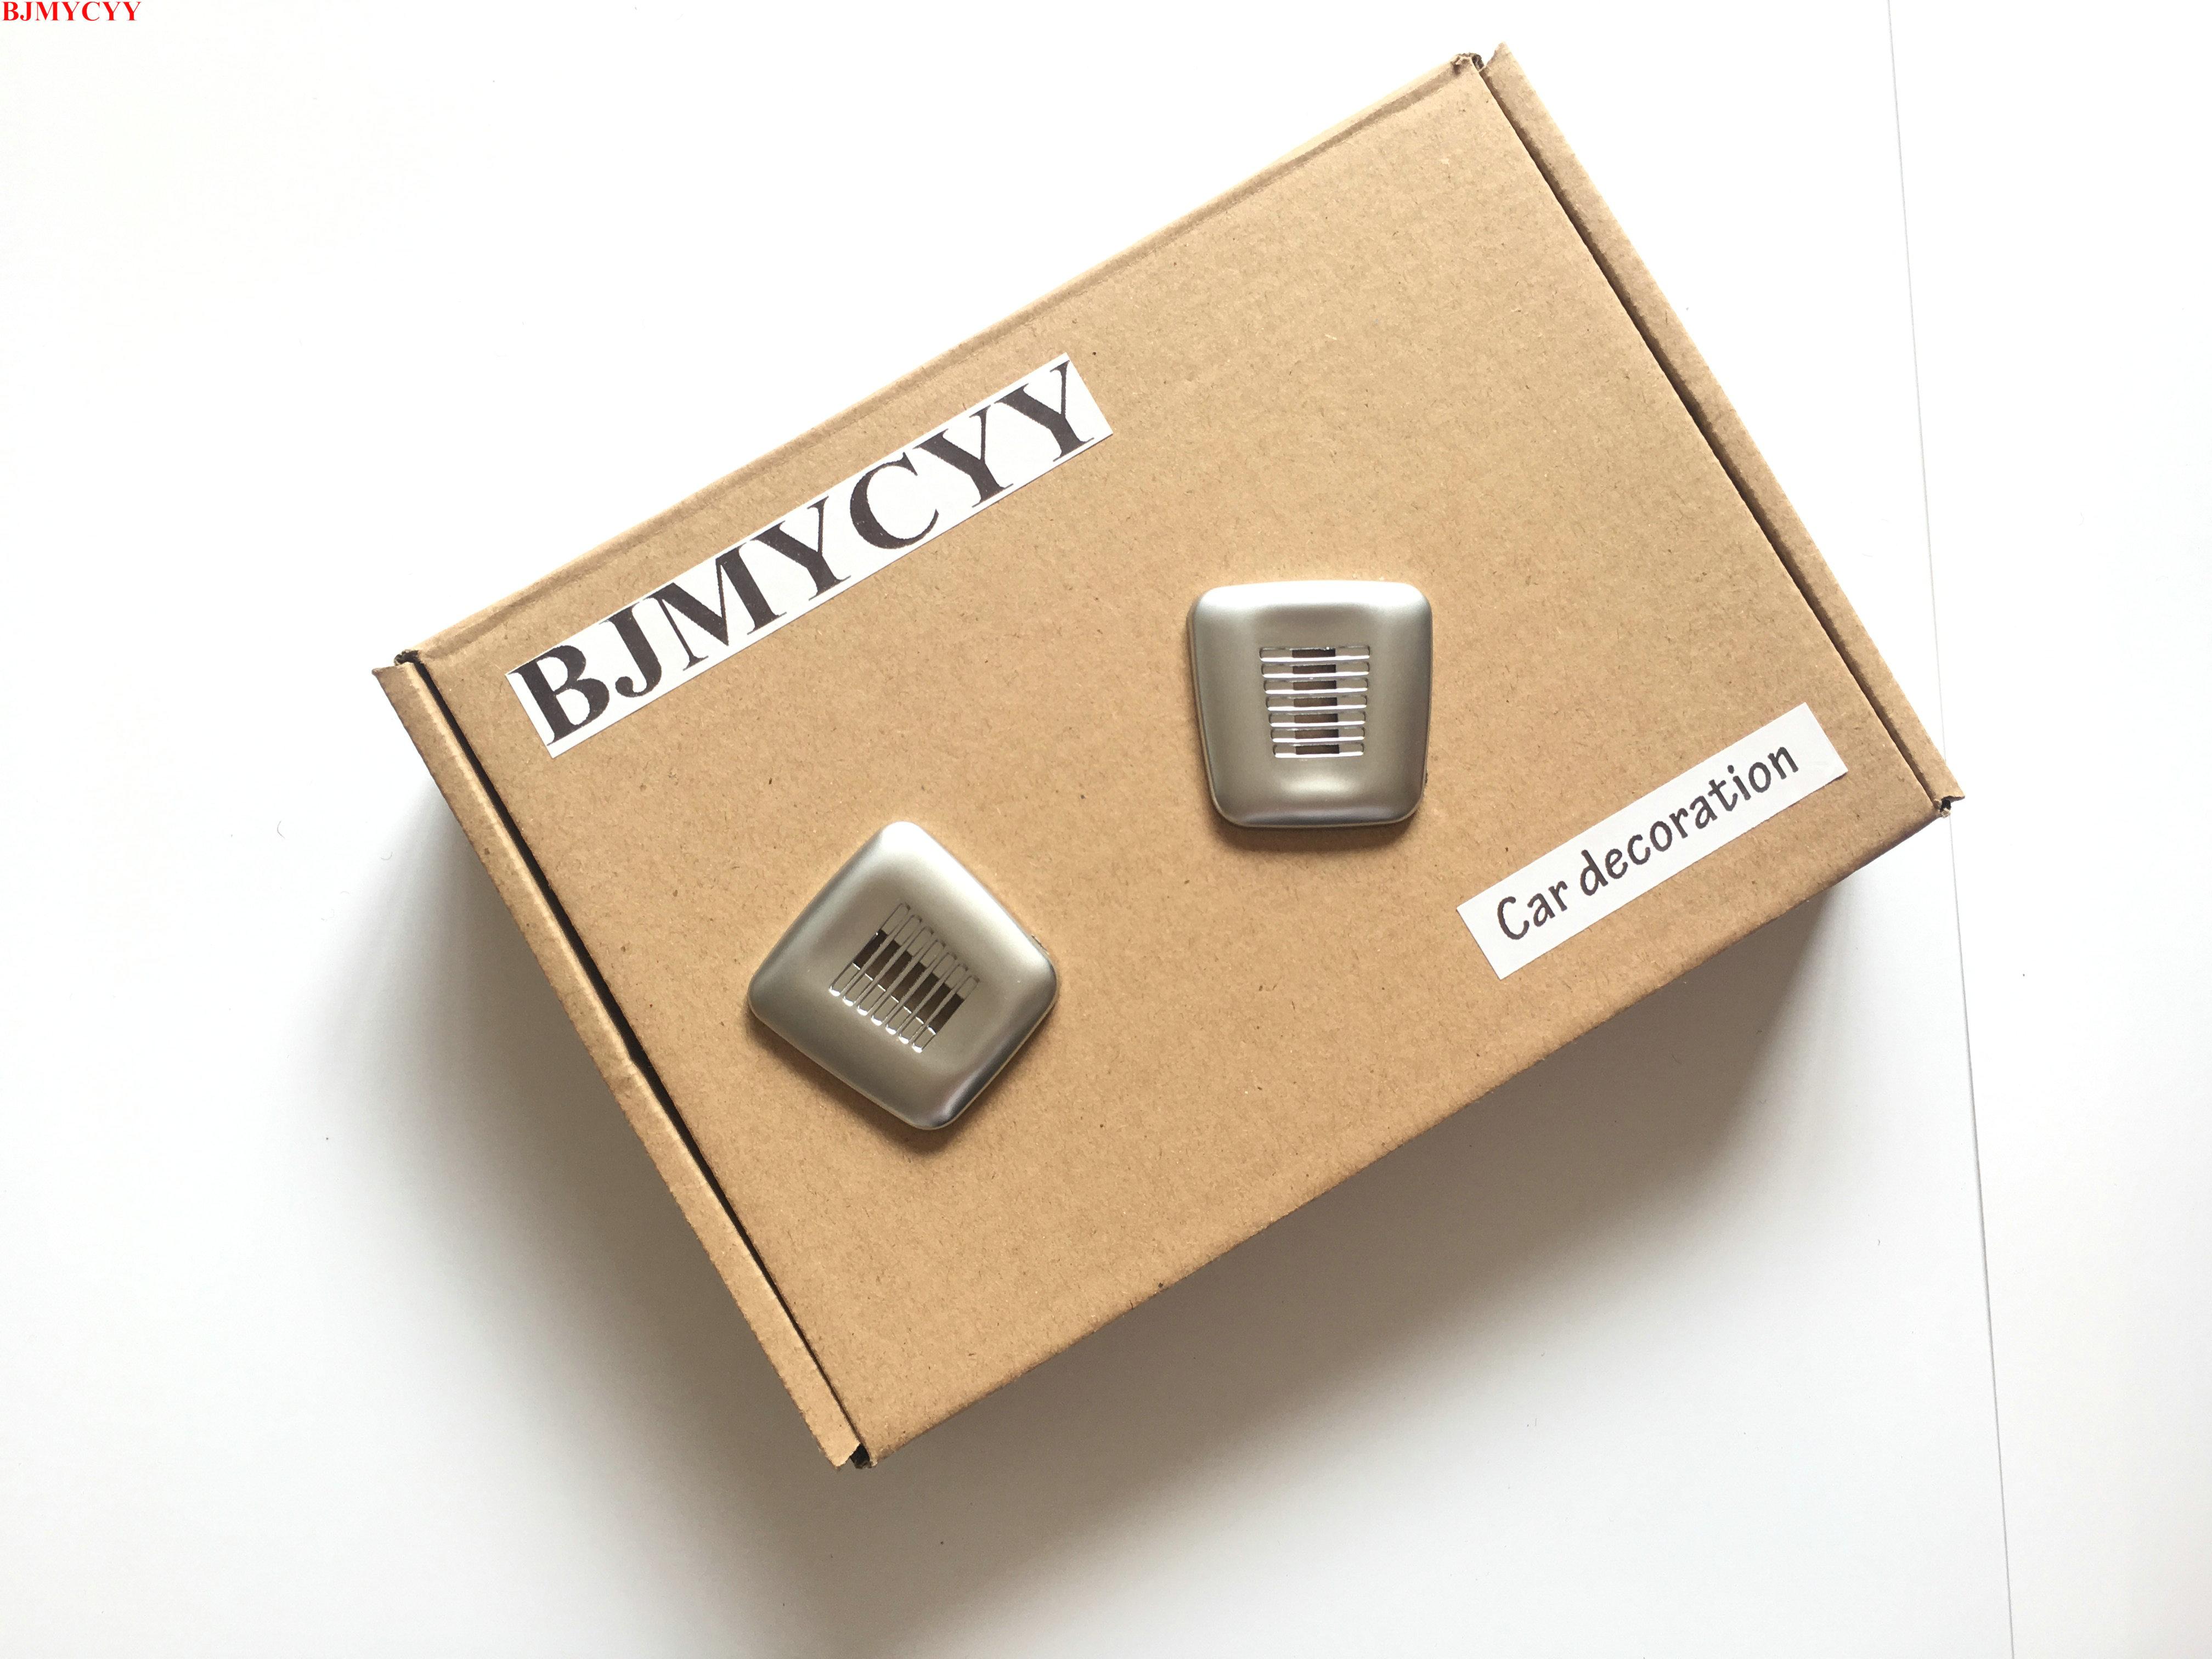 BJMYCYY 2Pcs բարձրախոսի ծածկույթների պարագաներ BMW F20 118i 116i X6 X5 GT X4 X6 2014 2015 2016